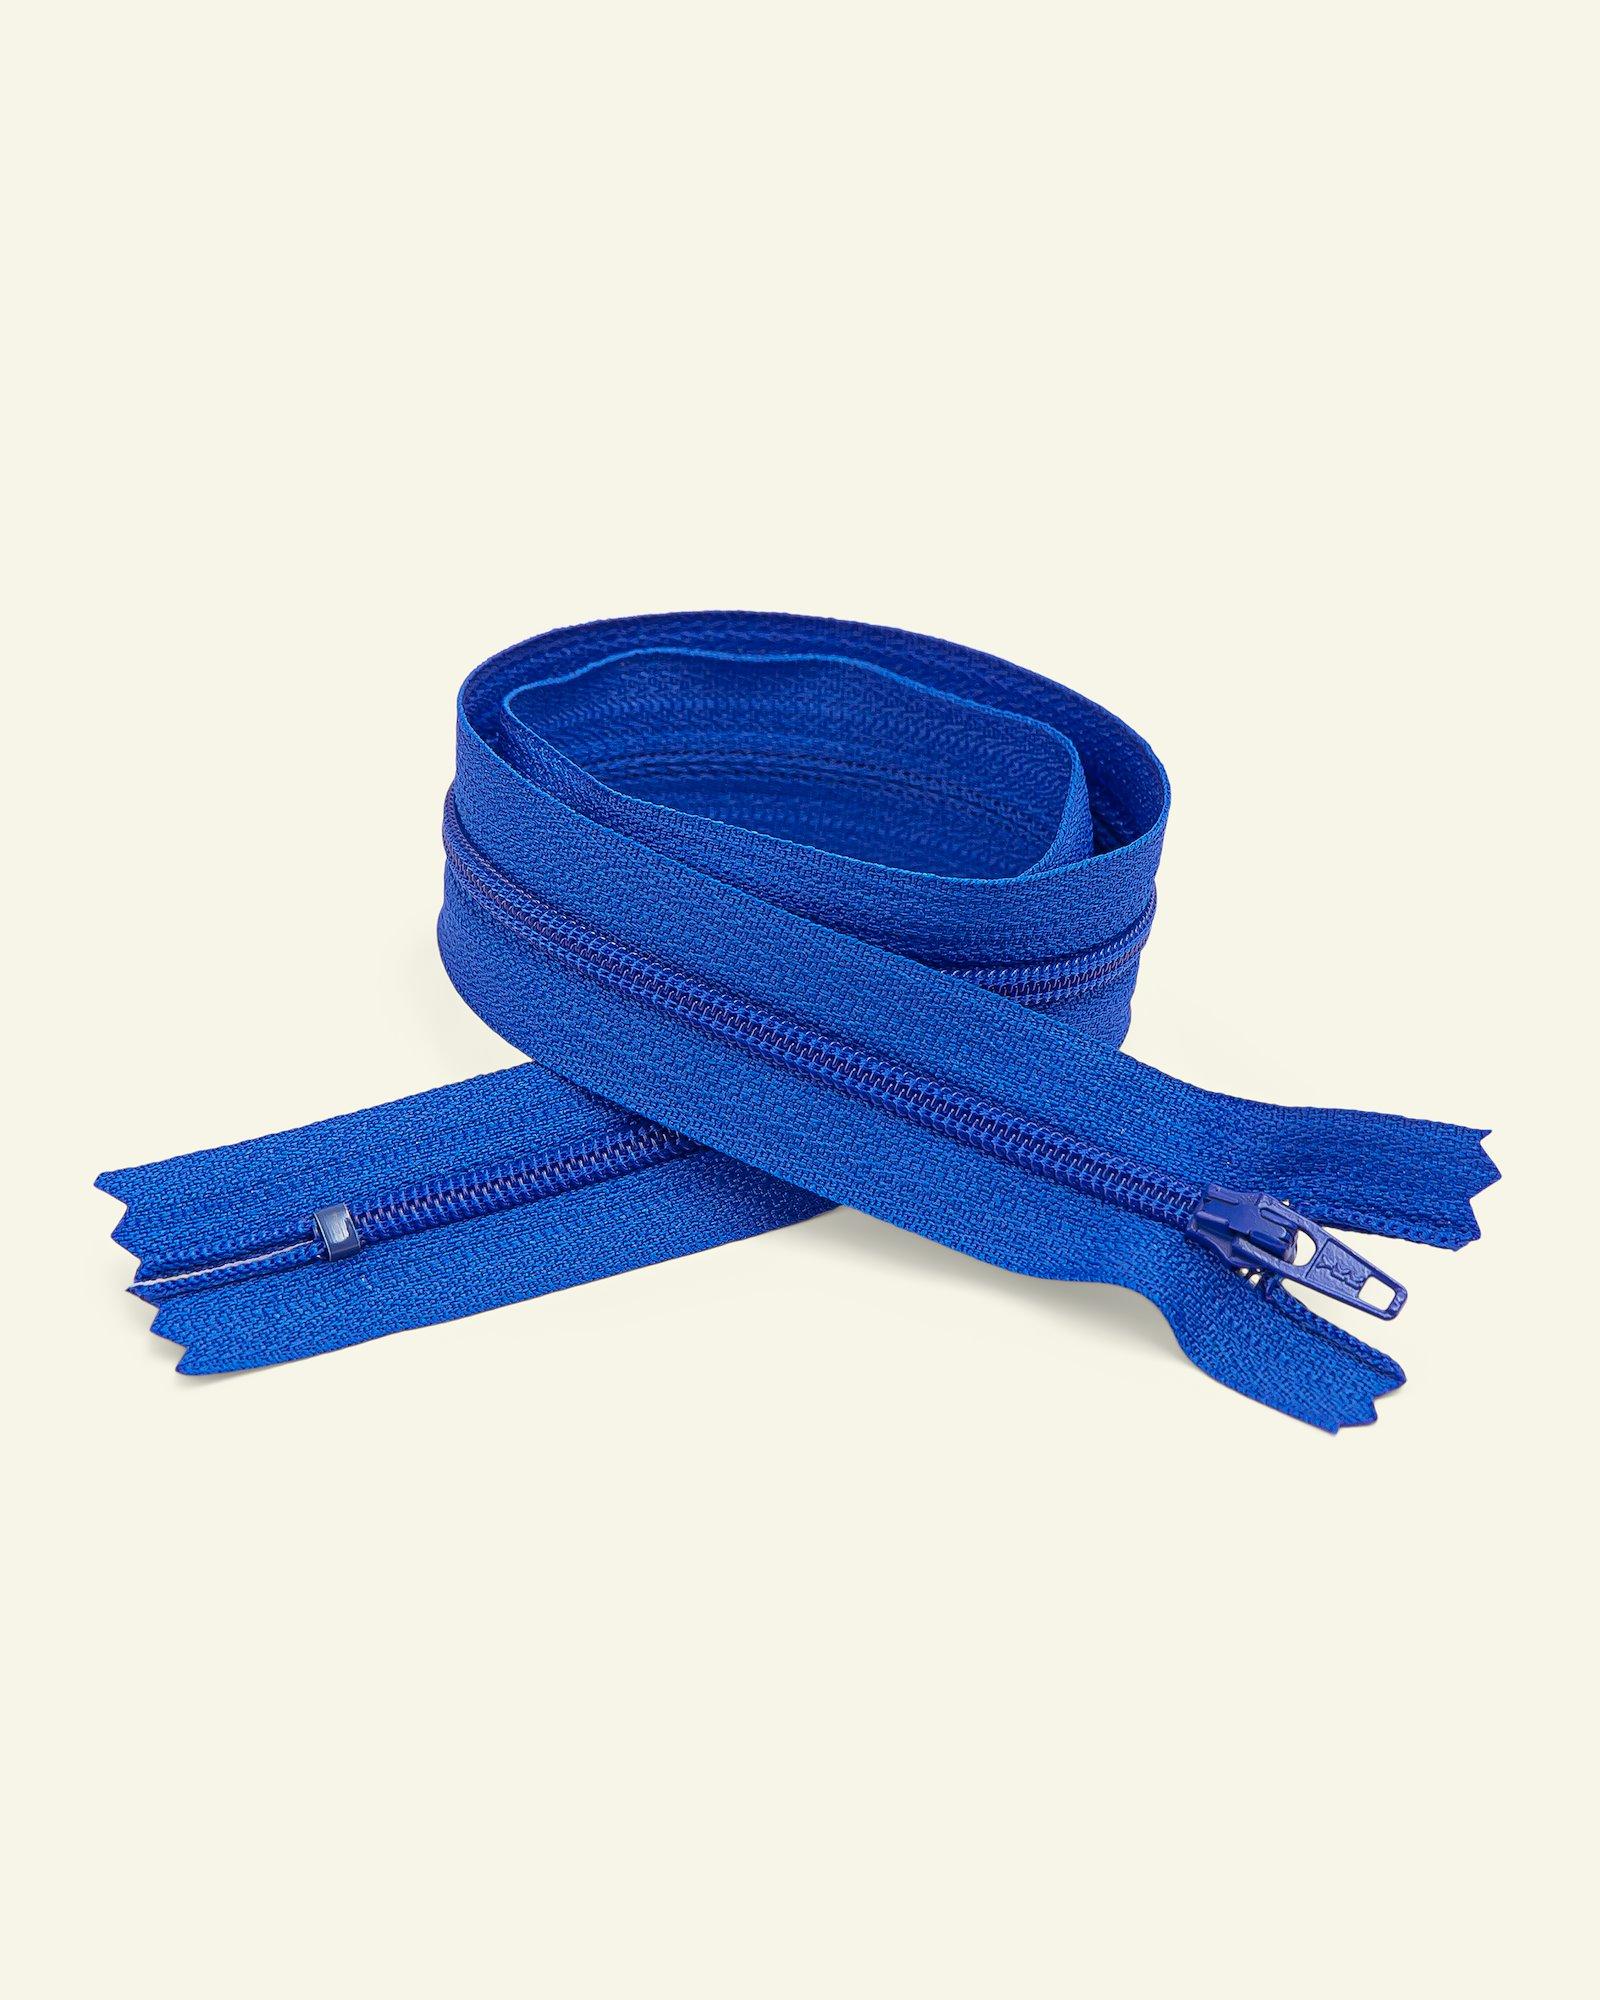 YKK zip 4mm coil closed end cobalt